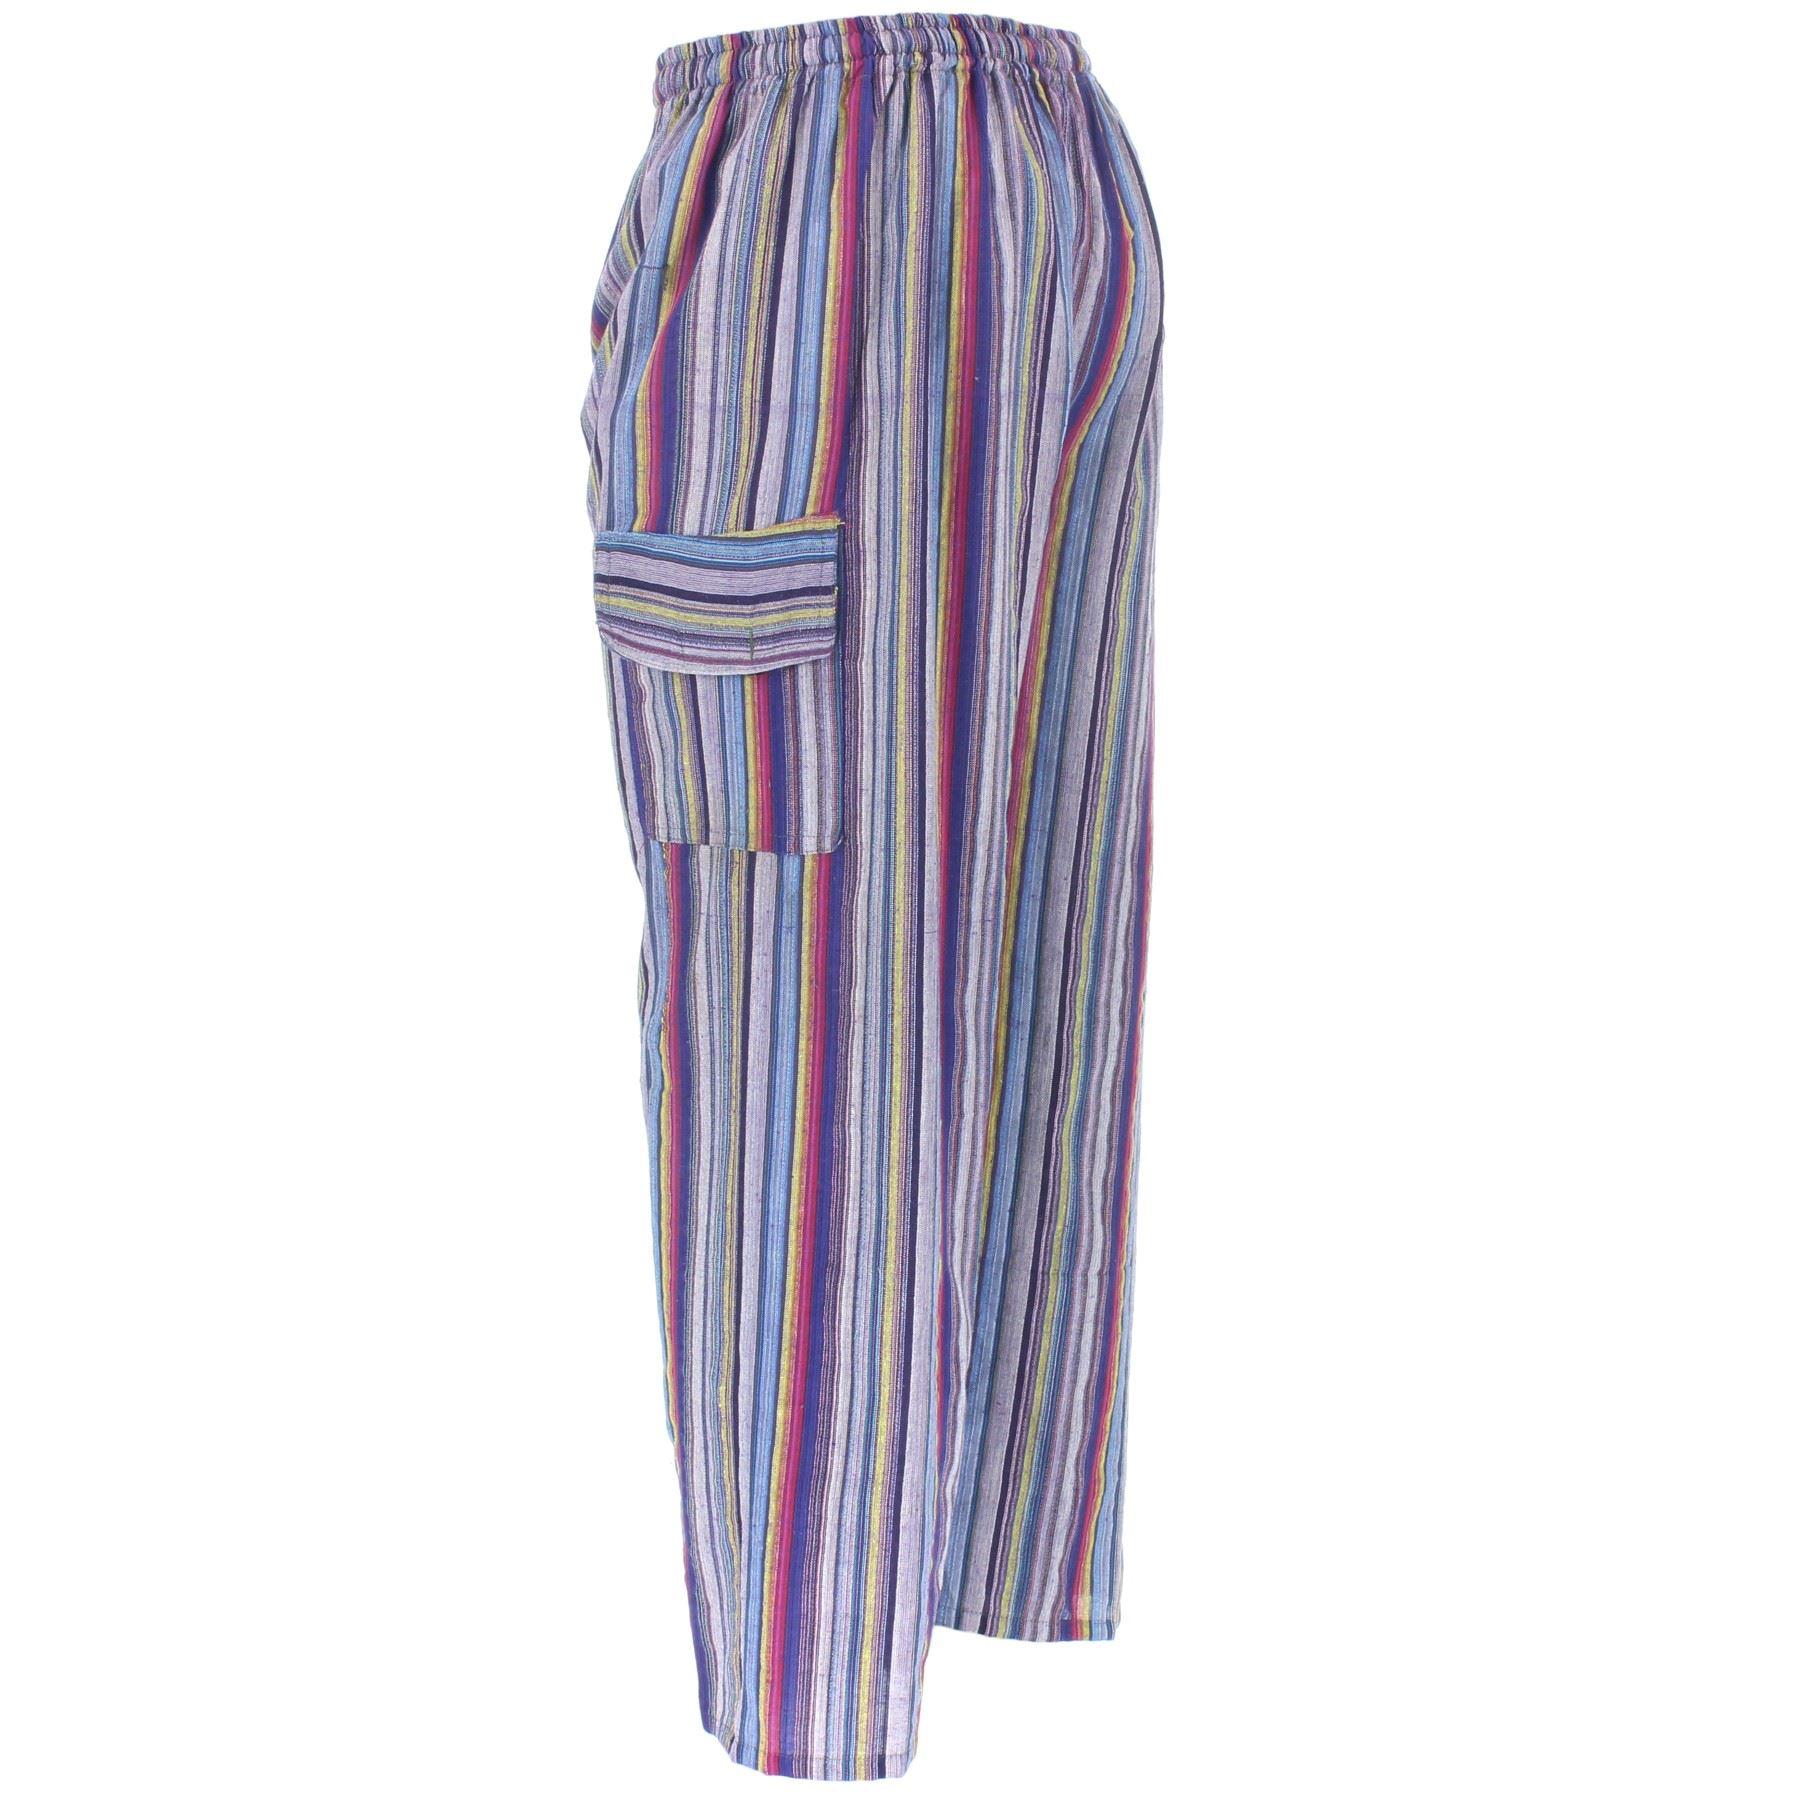 Wrangler Funky Hippie Striped Pants 1960s, New Never Worn ... |Hippie Striped Pants